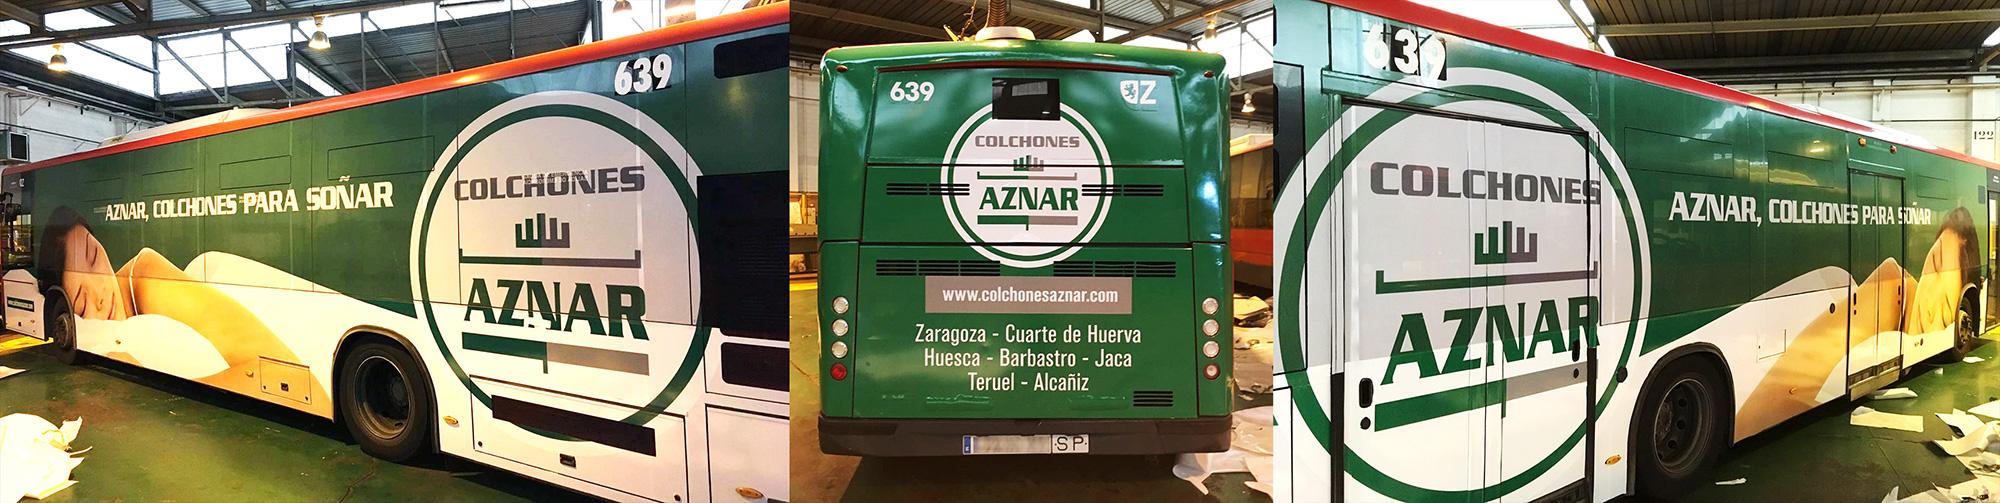 Autobús integral publicidad Zaragoza - Colchones Aznar